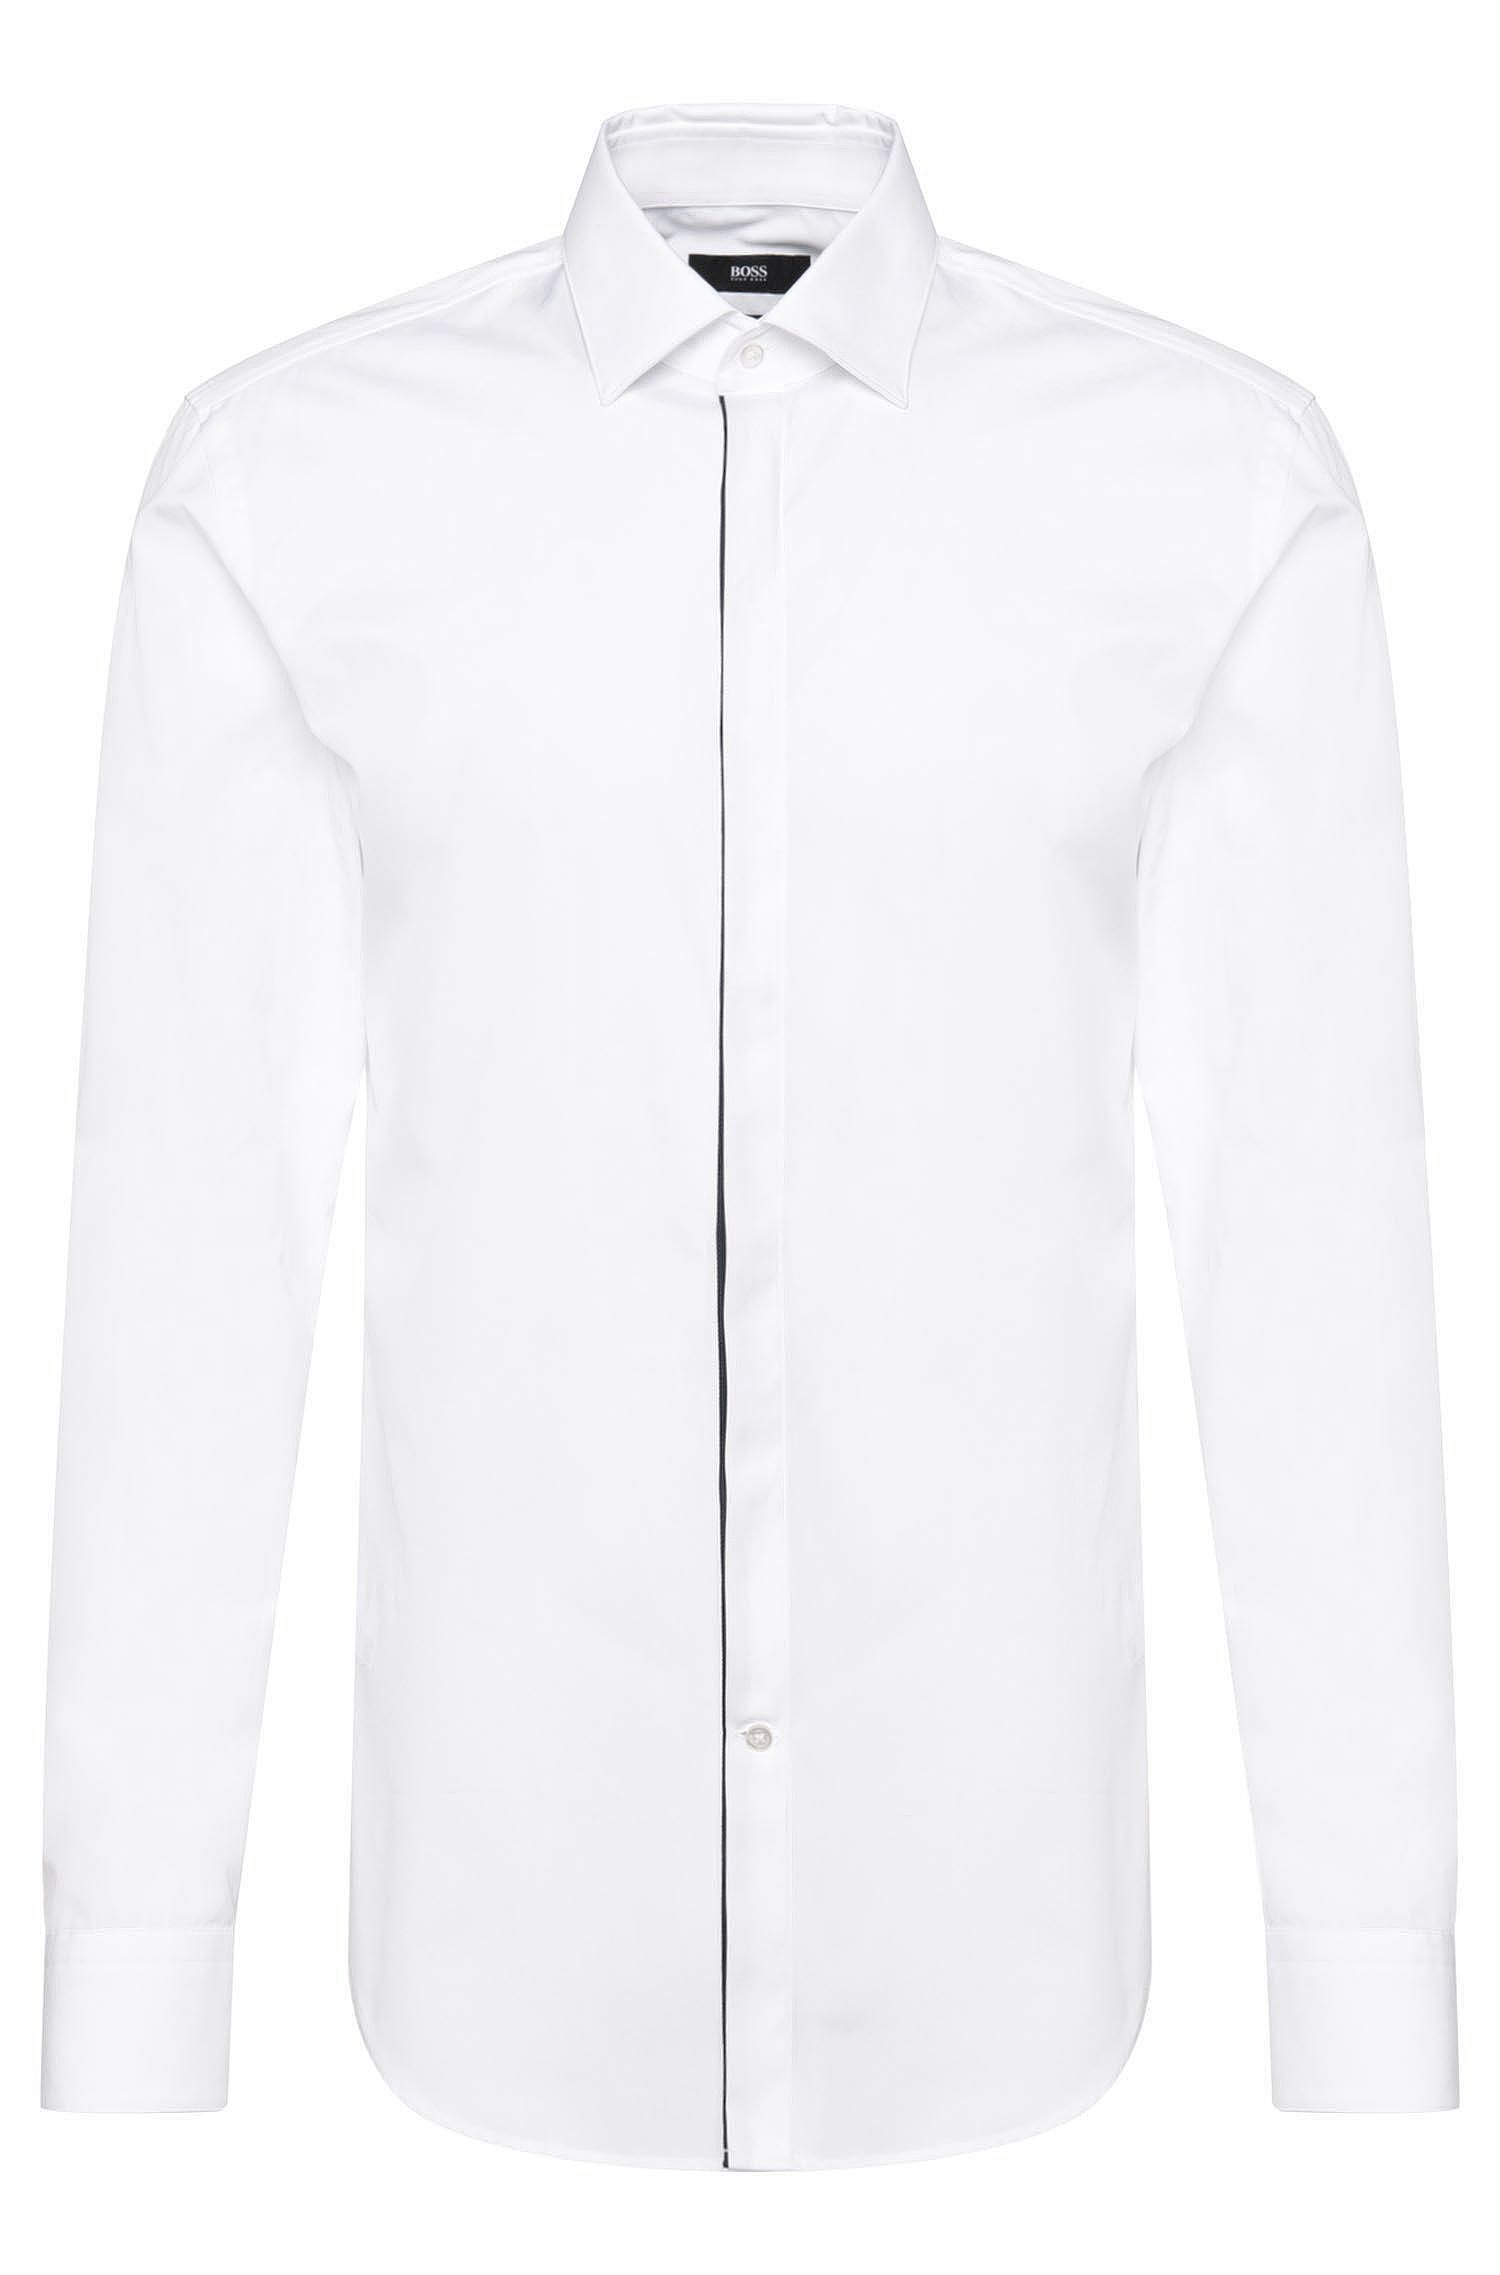 'Jamis' | Slim Fit, 2-Ply Italian Cotton Dress Shirt